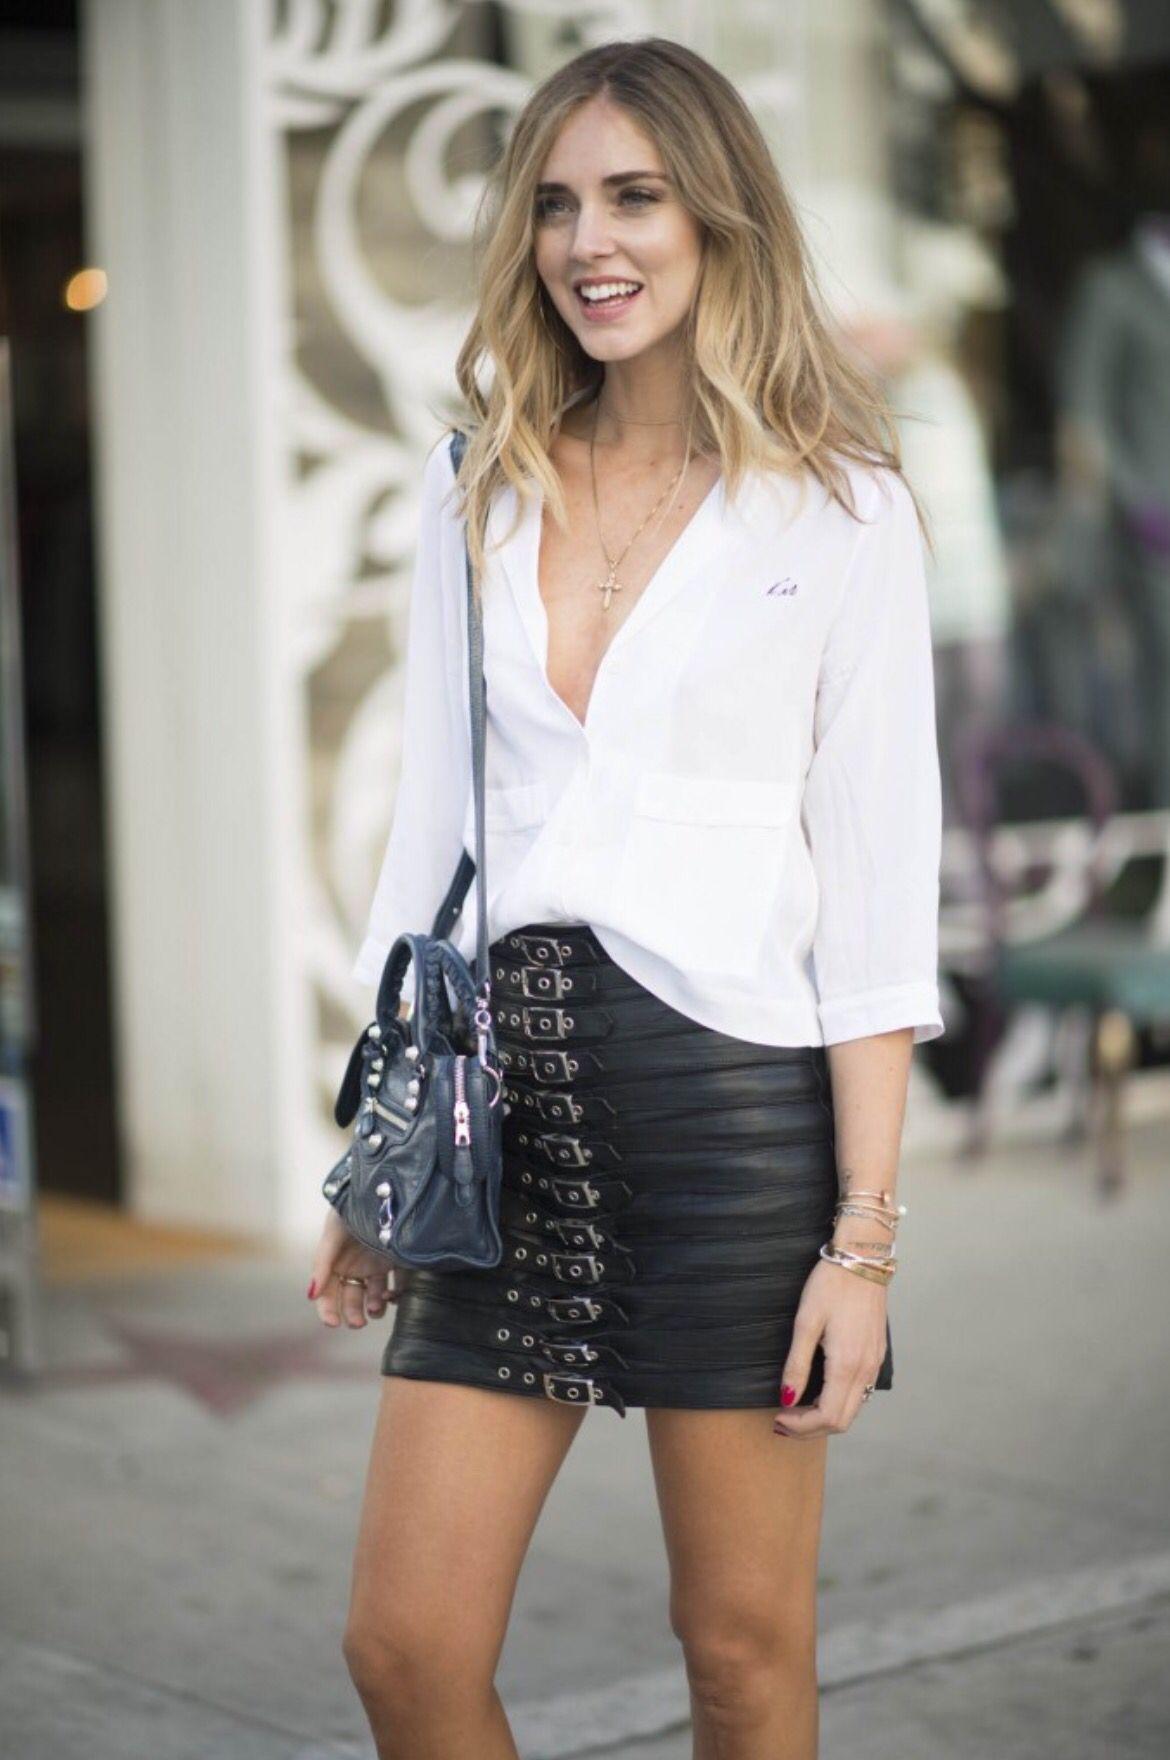 e30574854d Gorgeous Chiara Ferragni wearing our black leather skirt #Chiara  #ChiaraFerragni #Blogger #Blog #Fashion #Style #Trends #Leather # LeatherSkirt #Skirt